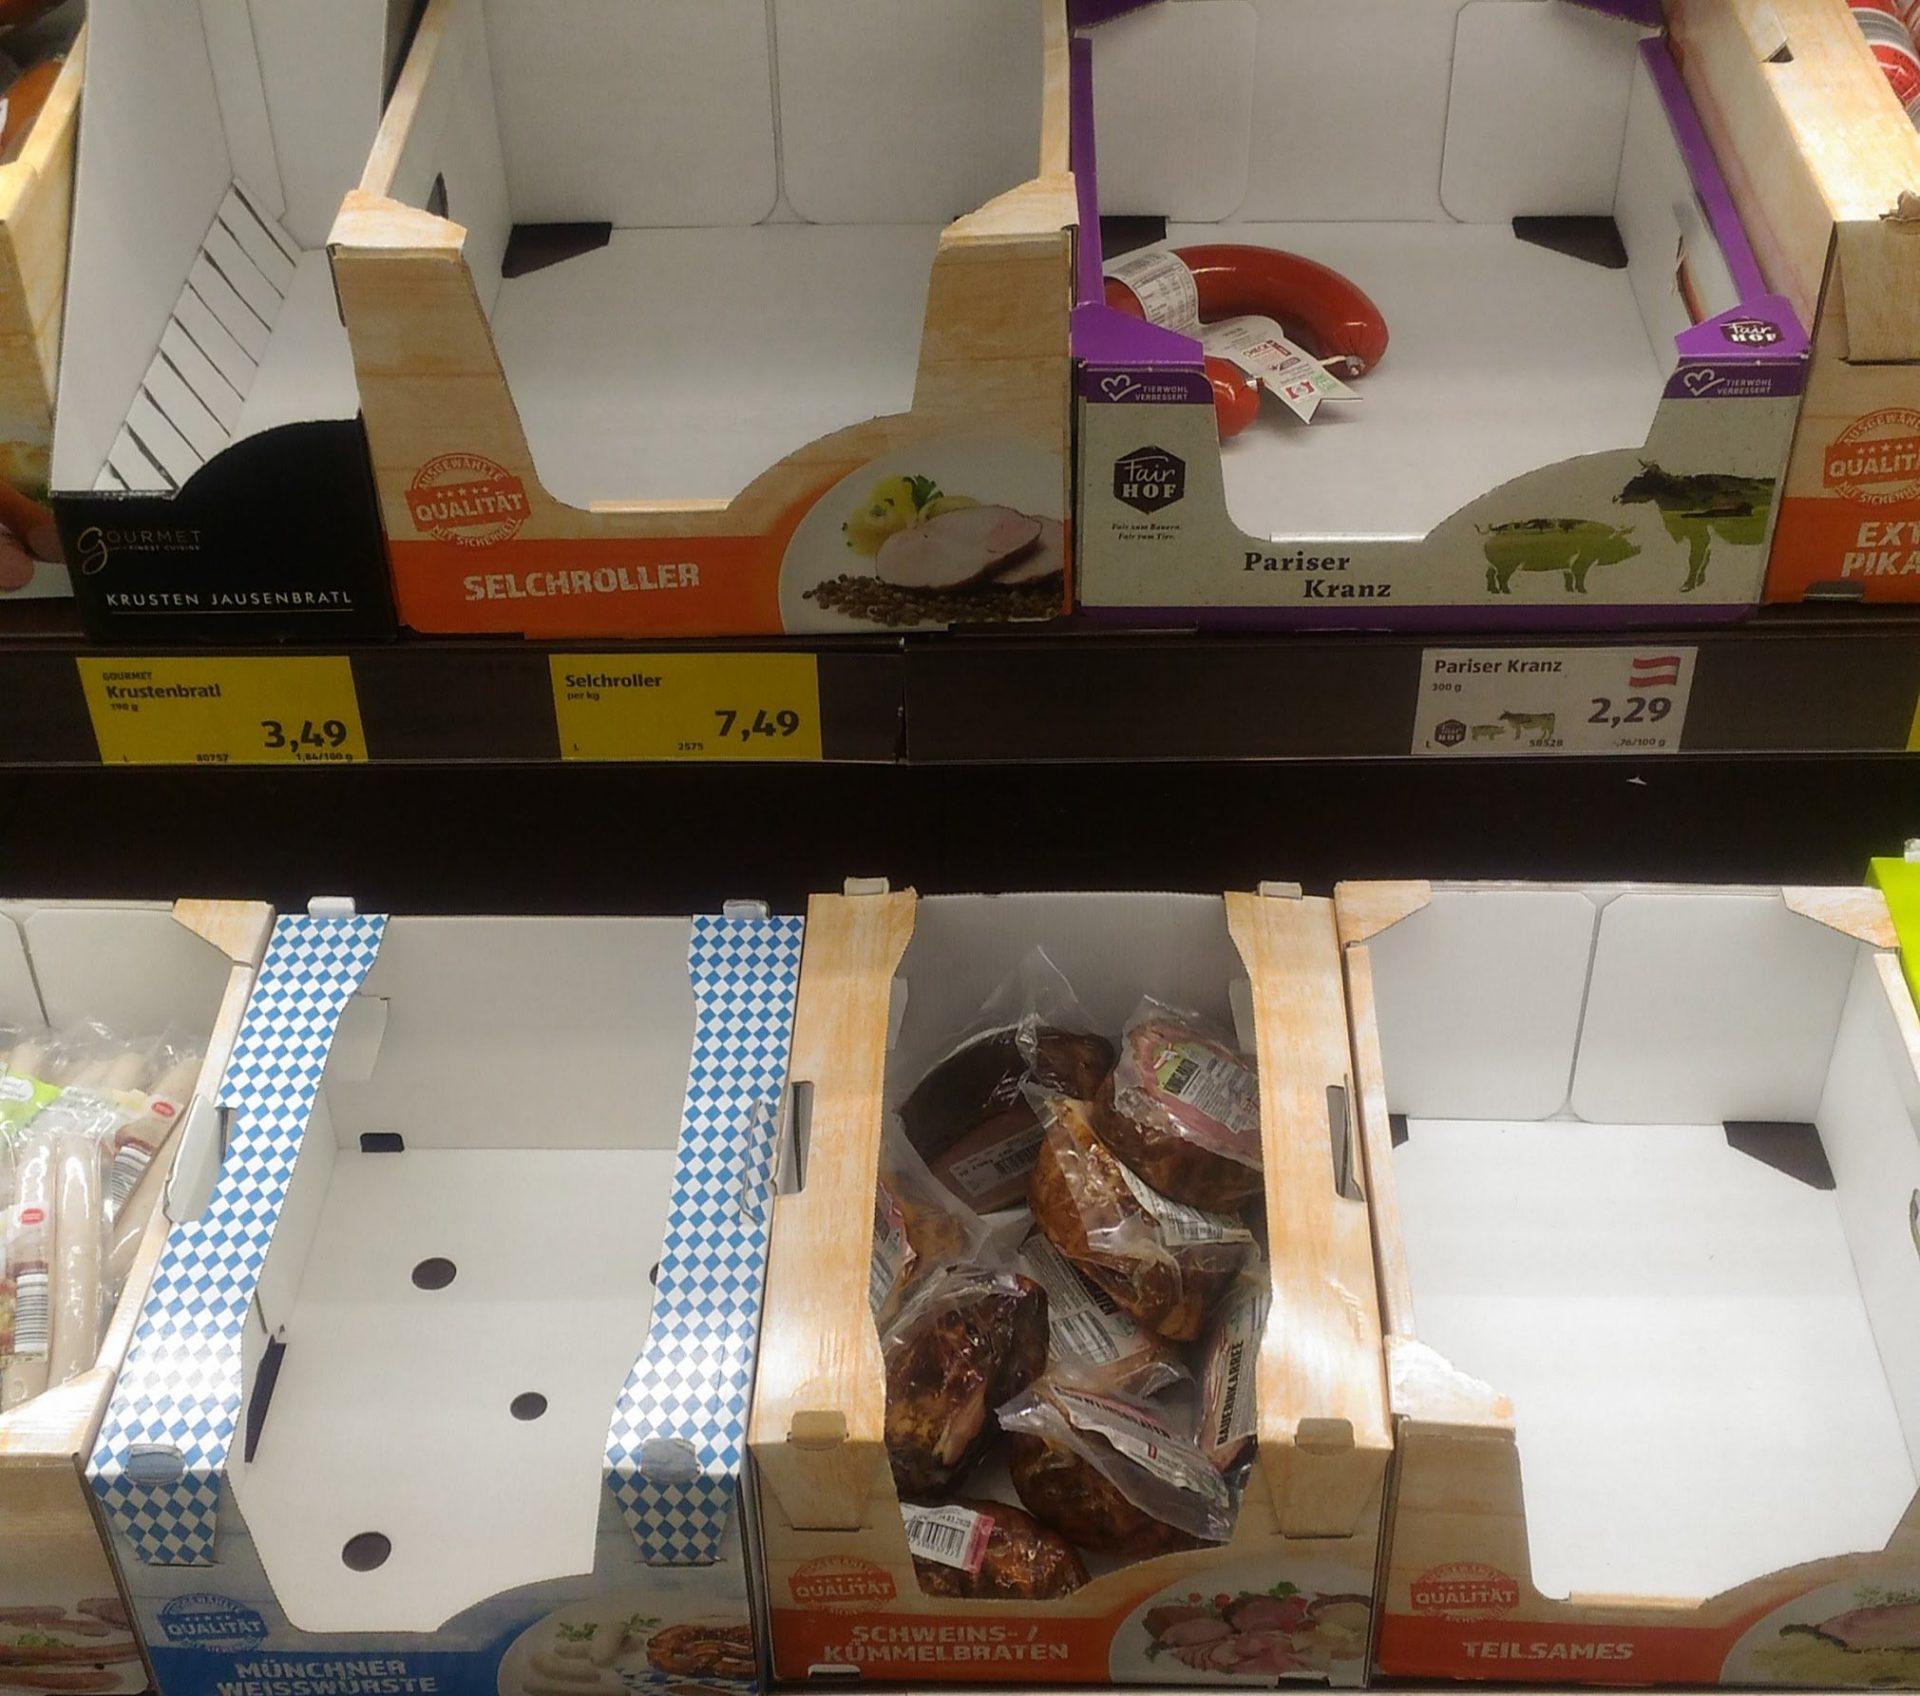 Наблюдения эмигранта. Пустые полки в австрийских супермаркетах из-за коронавируса?